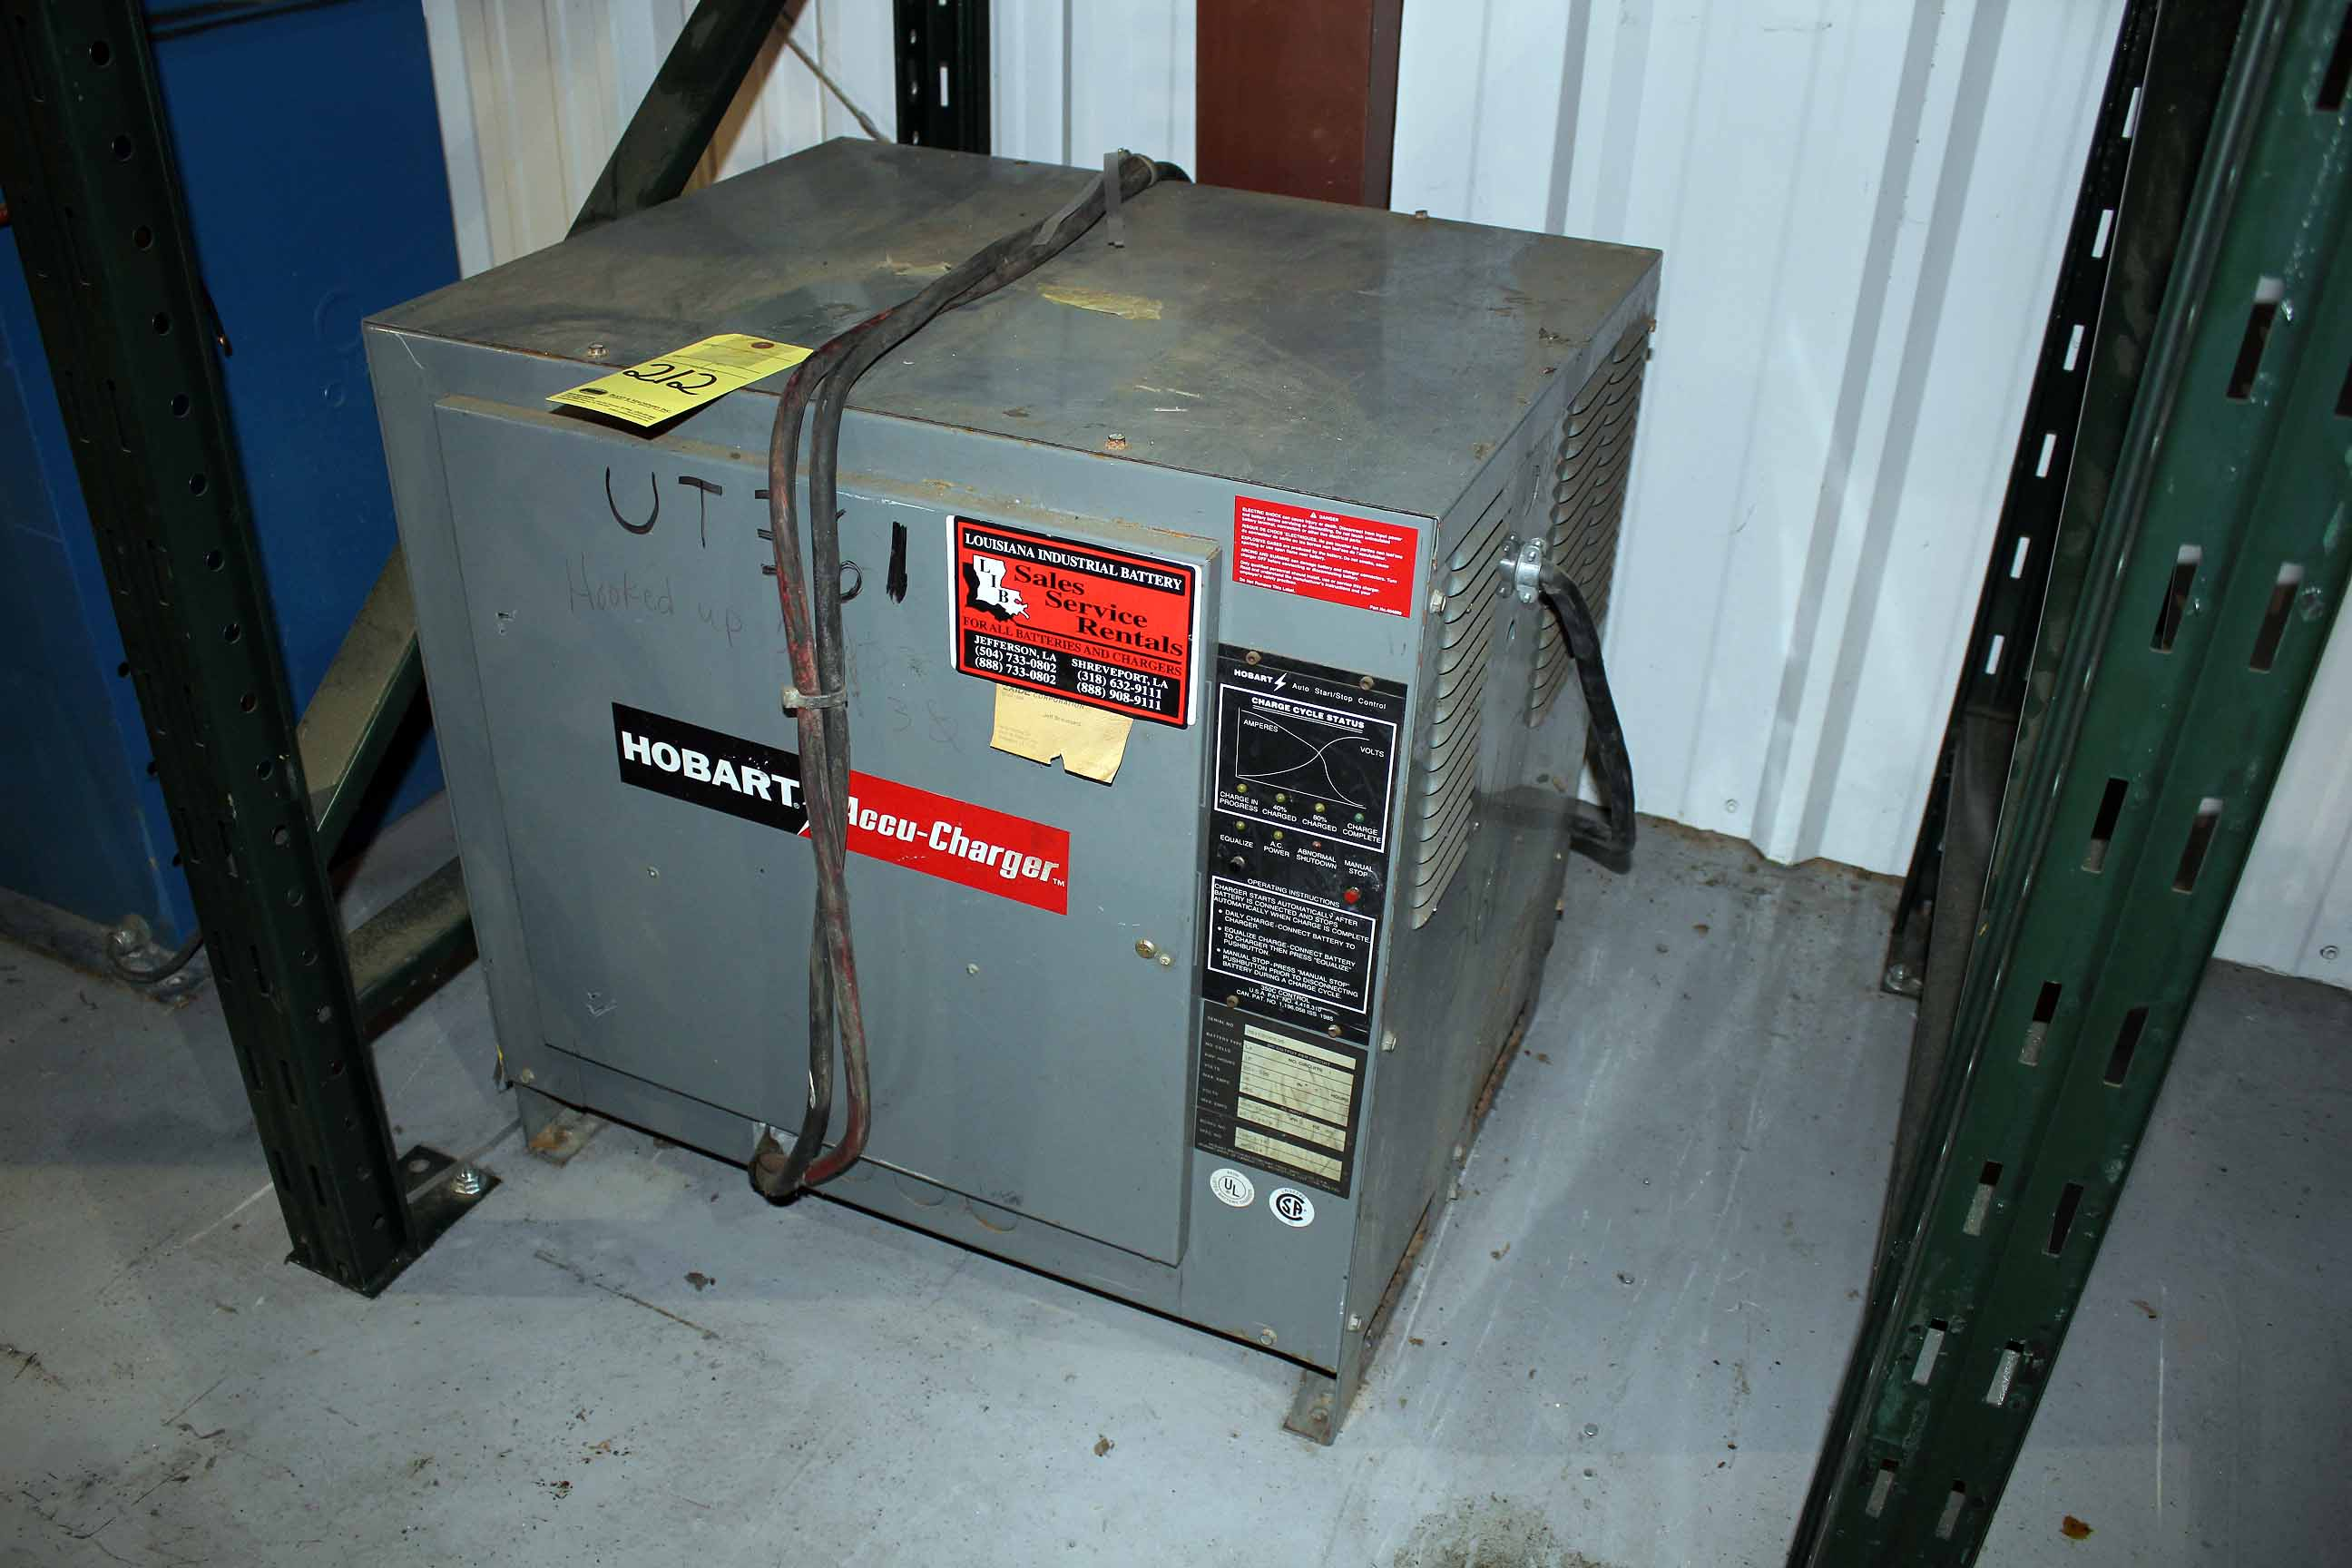 battery charger hobart mdl 725c3 18 18 cell 145 amps s n 391cs05536 rh bidspotter com 4289 Hobart Fork Lift Battery Charger Spec Hobart Fork Lift Battery Chargers